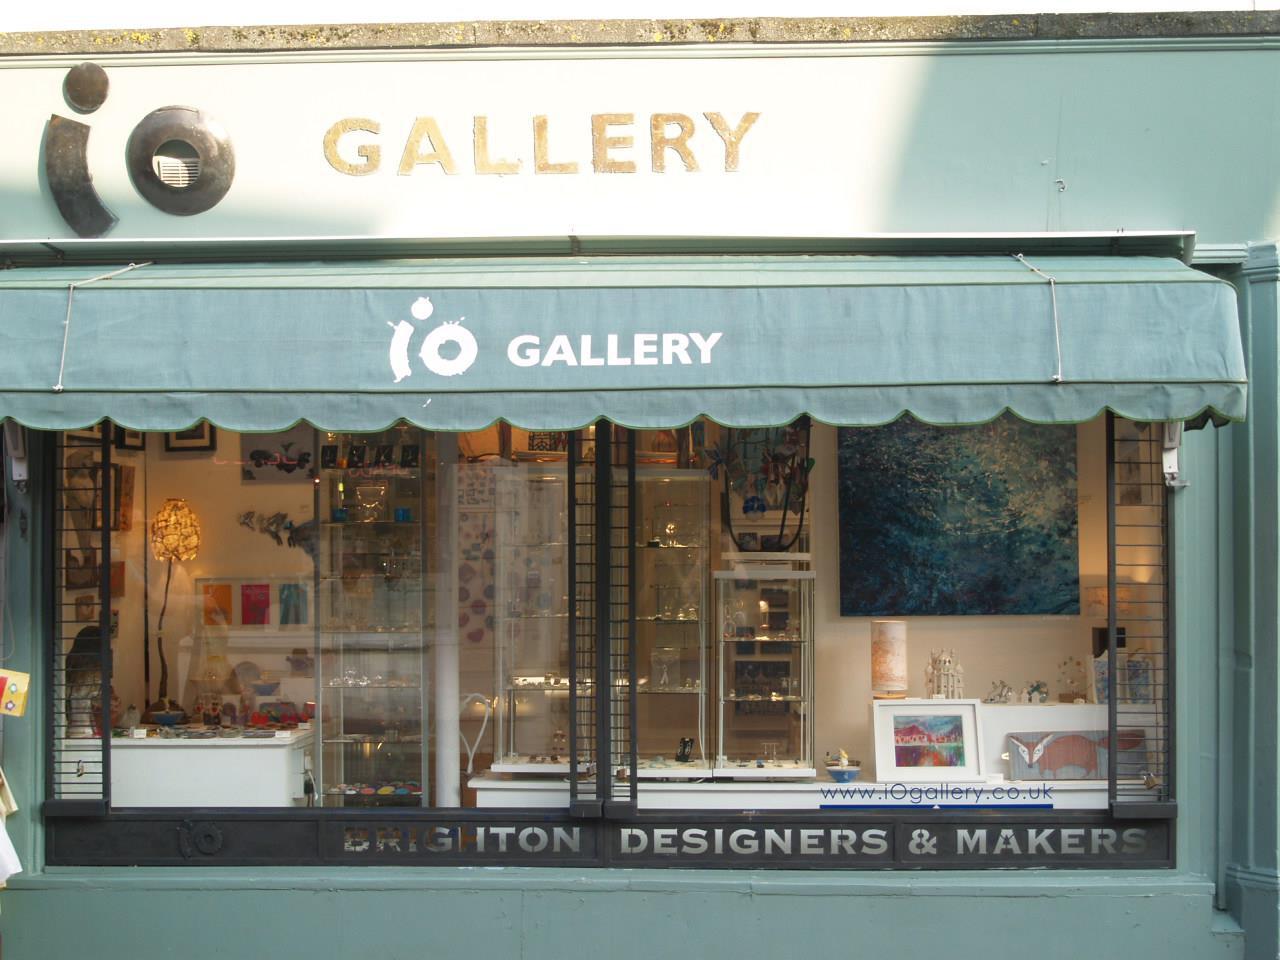 iO Gallery